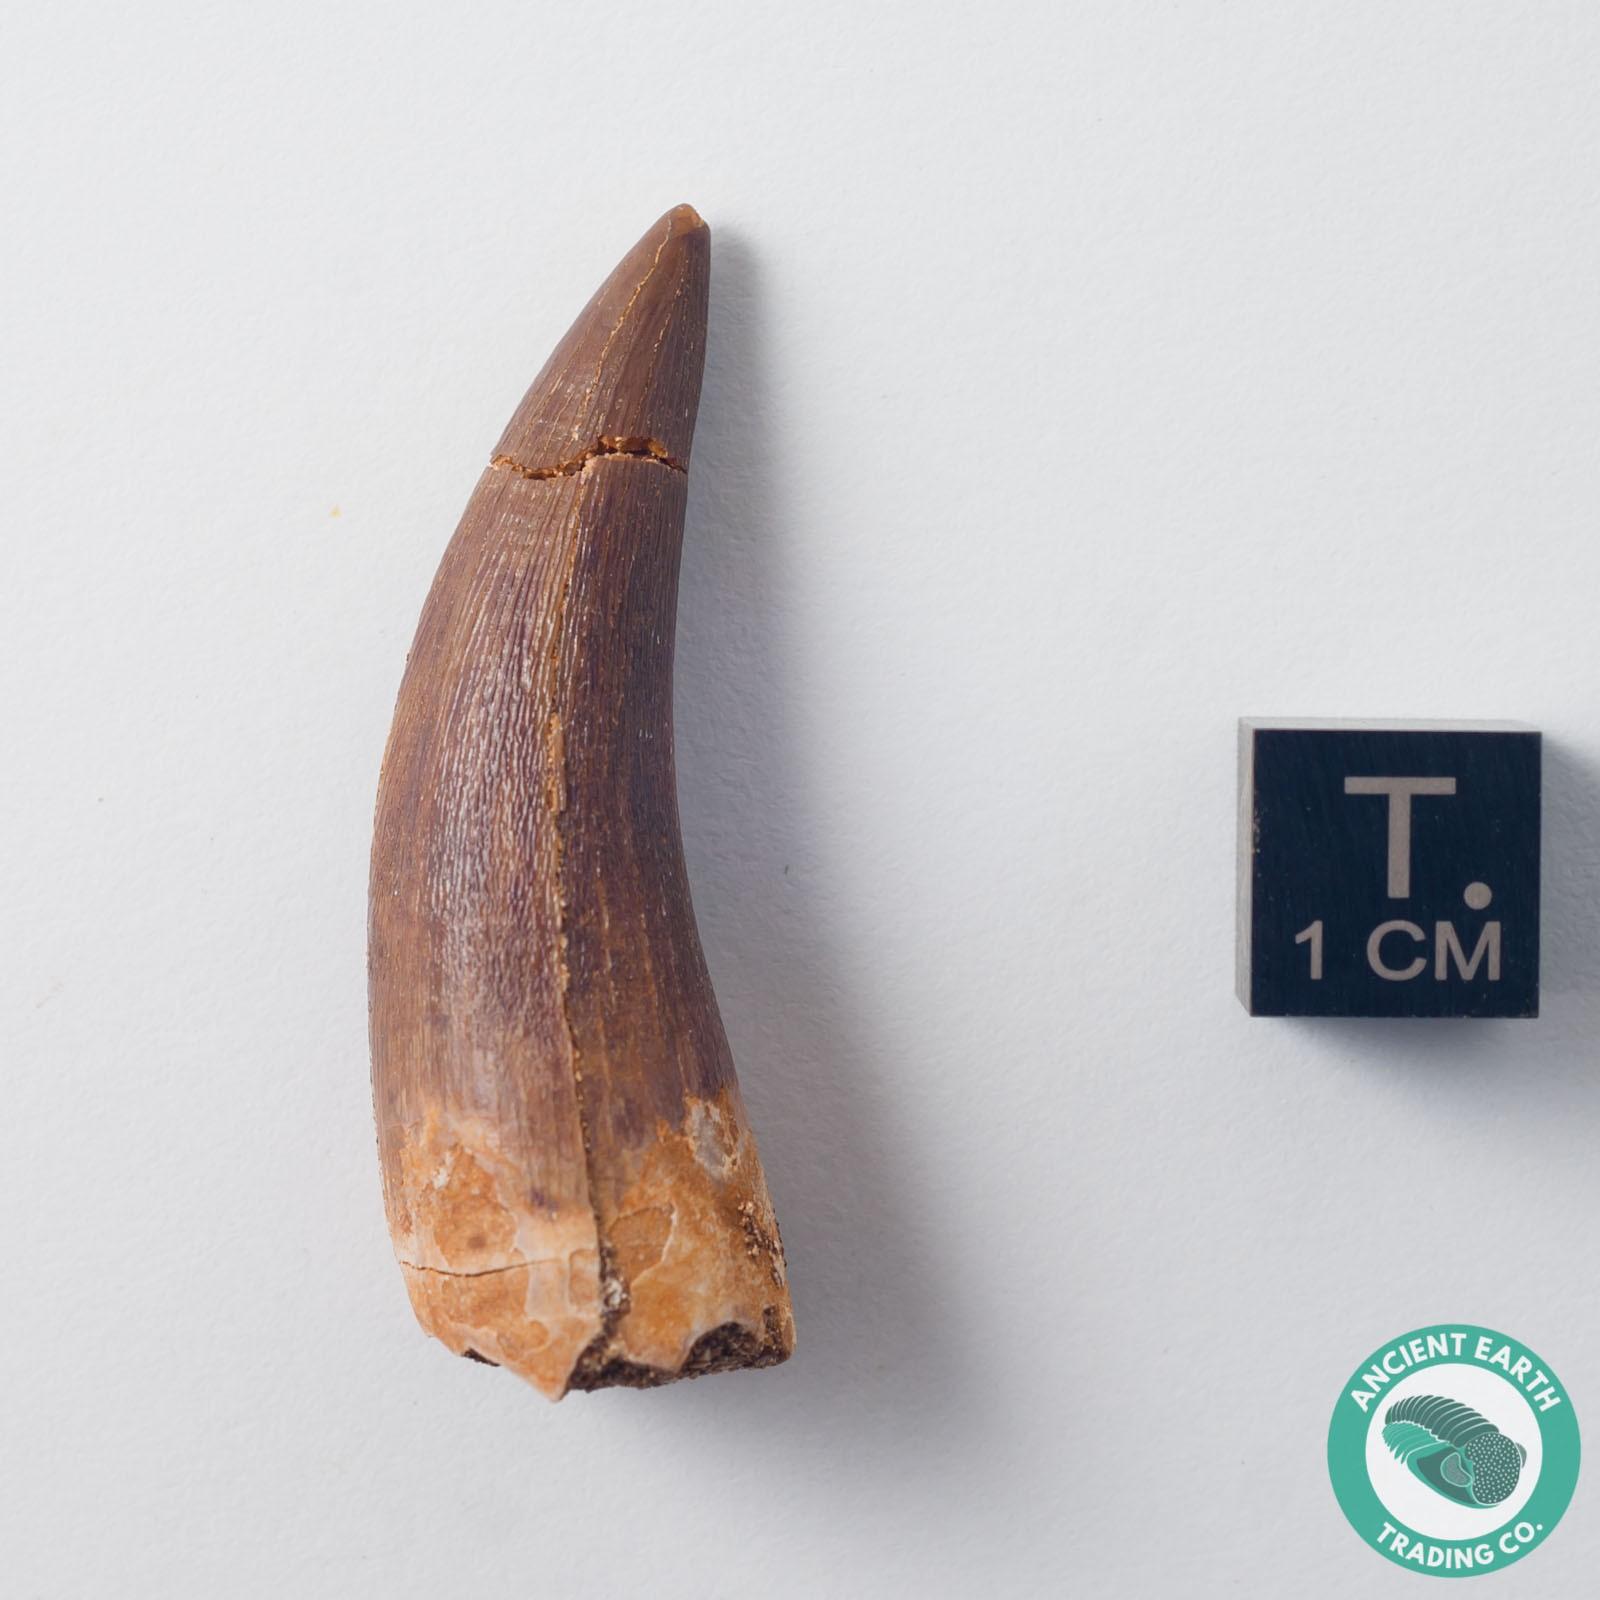 1.65 in. Plesiosaur Zarafasaura Fossil Tooth - Morocco